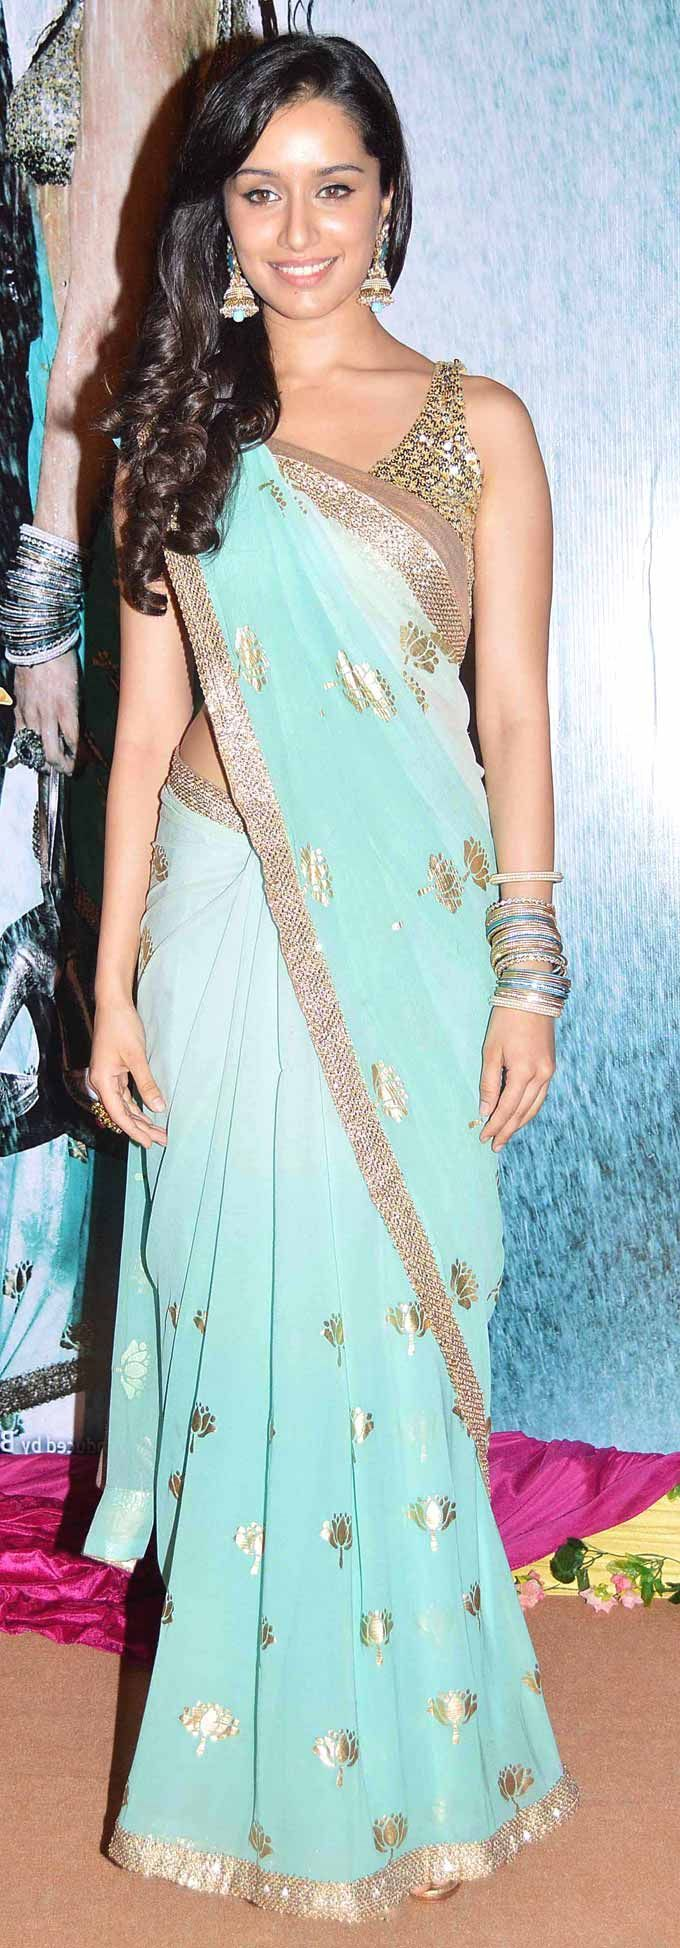 Audrey Aautou HD Wallpaper. | Shraddha kapoor, Saree and Indian fashion